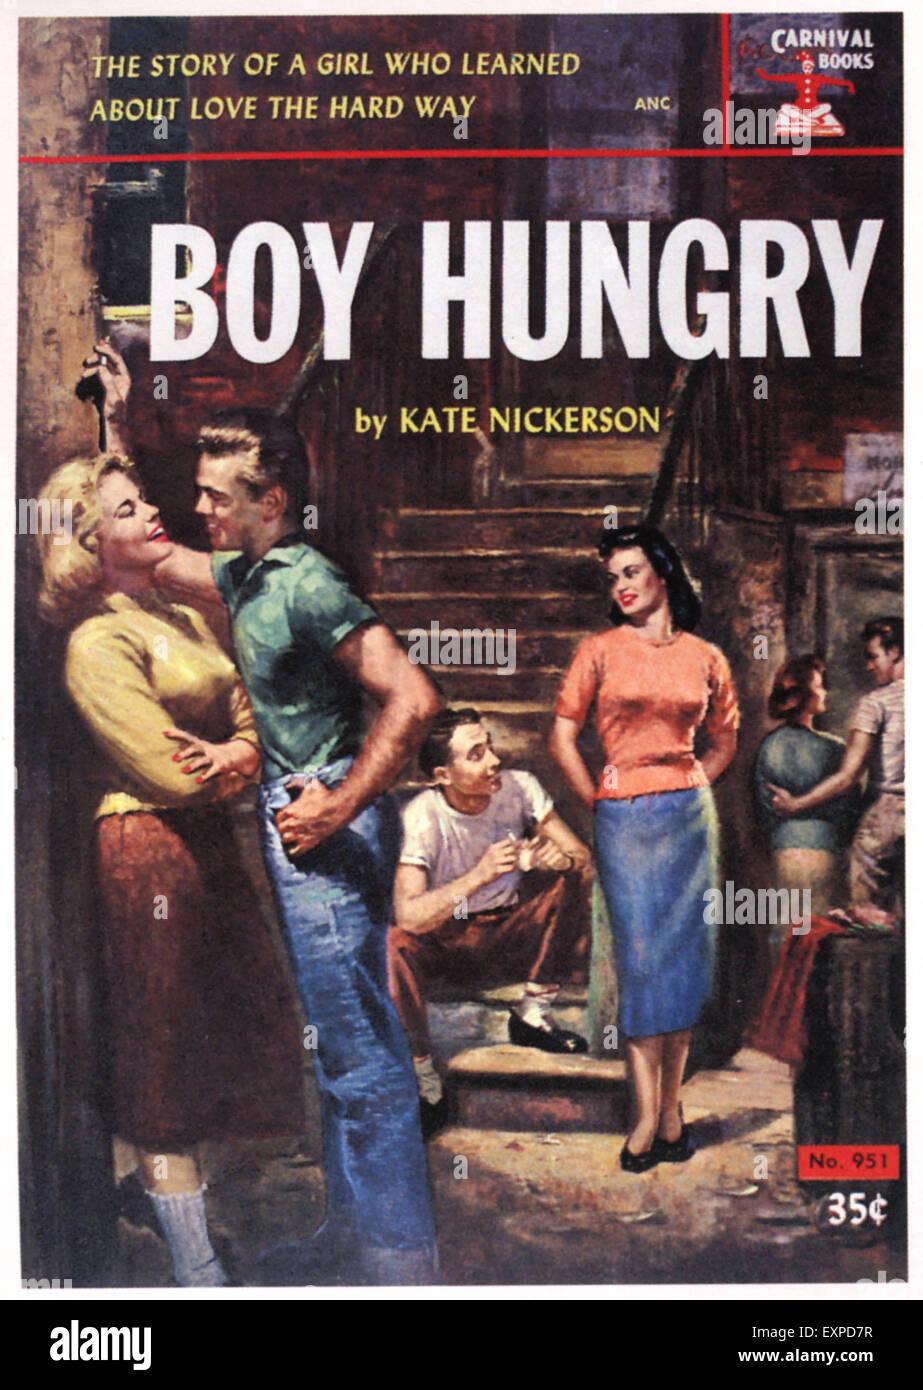 Book Cover Forros Usa : Pulp fiction book cover stock photos